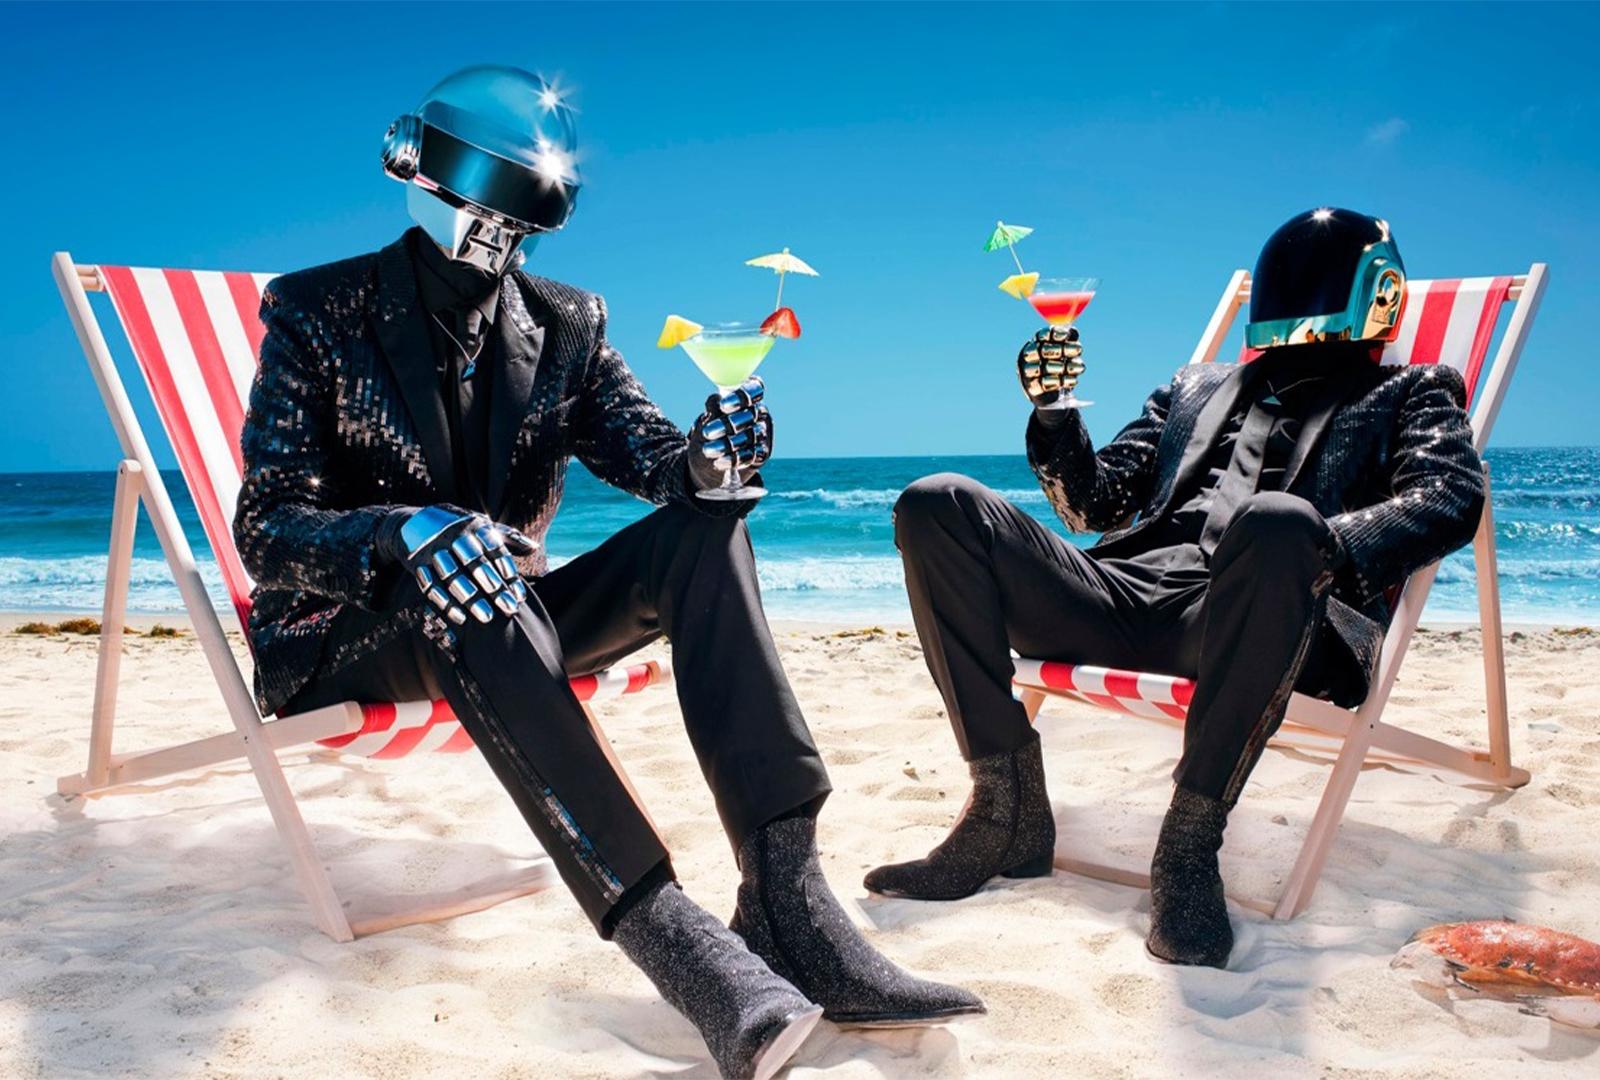 Daft Punk's Homework and Alive 1997 get vinyl reissue  image